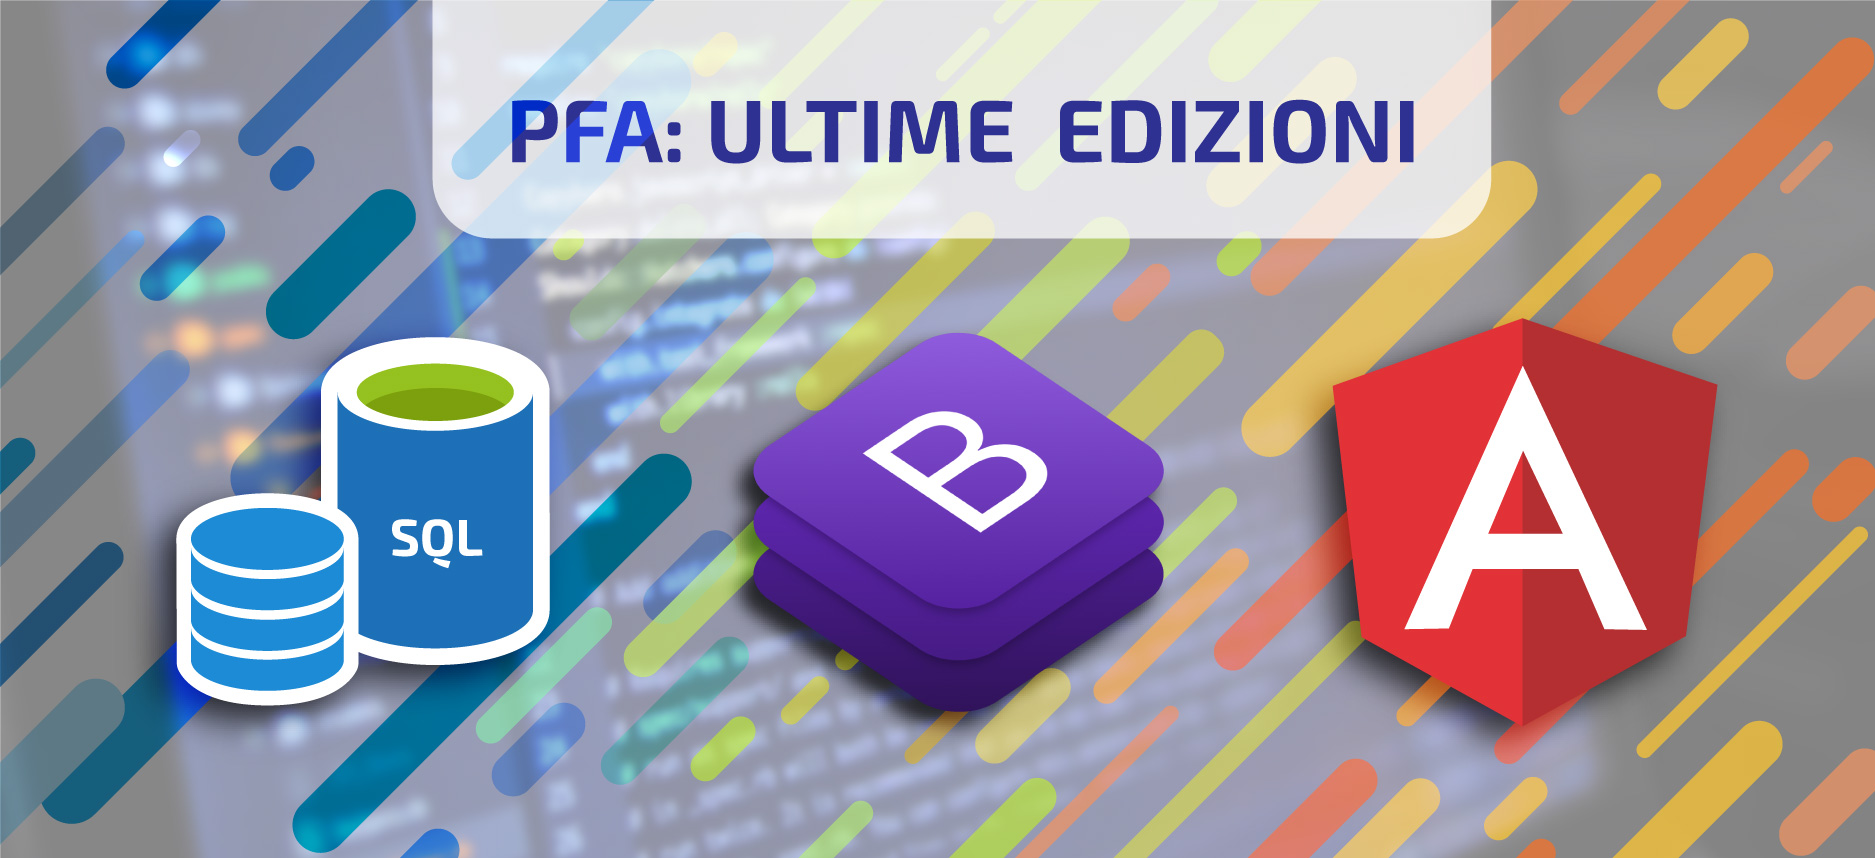 PFA Ultime Edizioni header